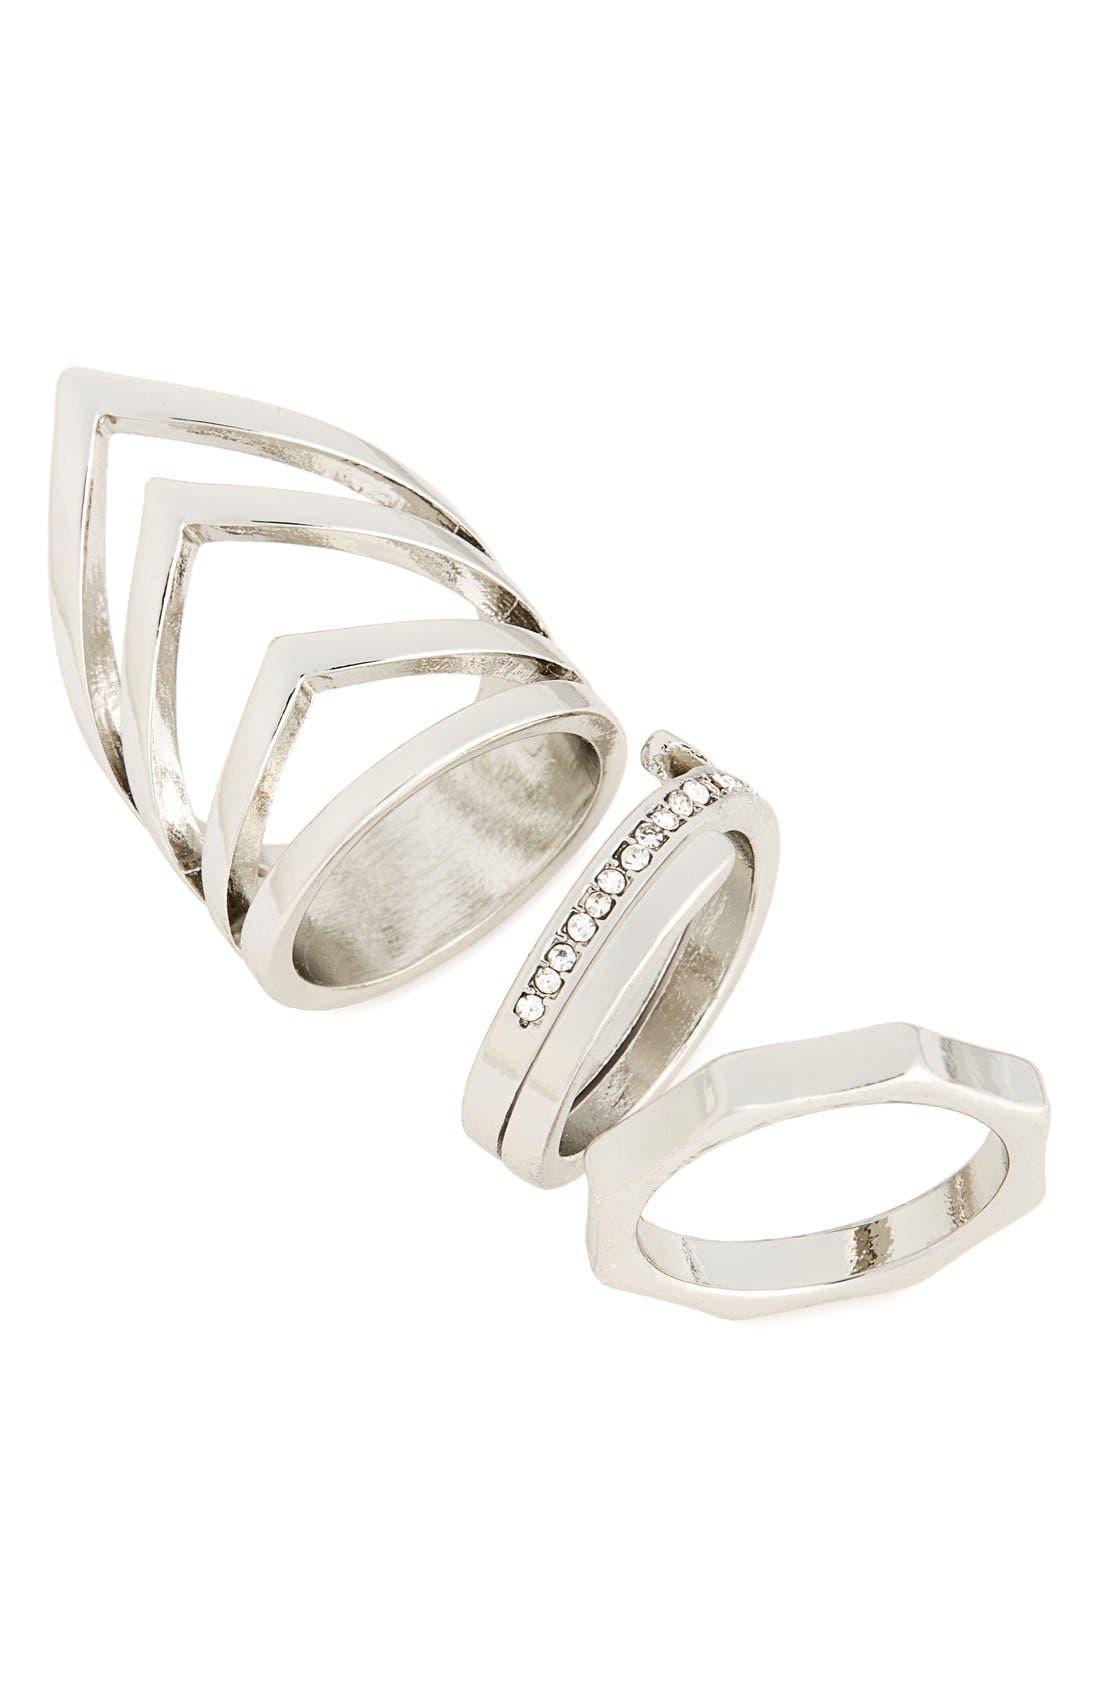 Main Image - Topshop Set of 3 Rings